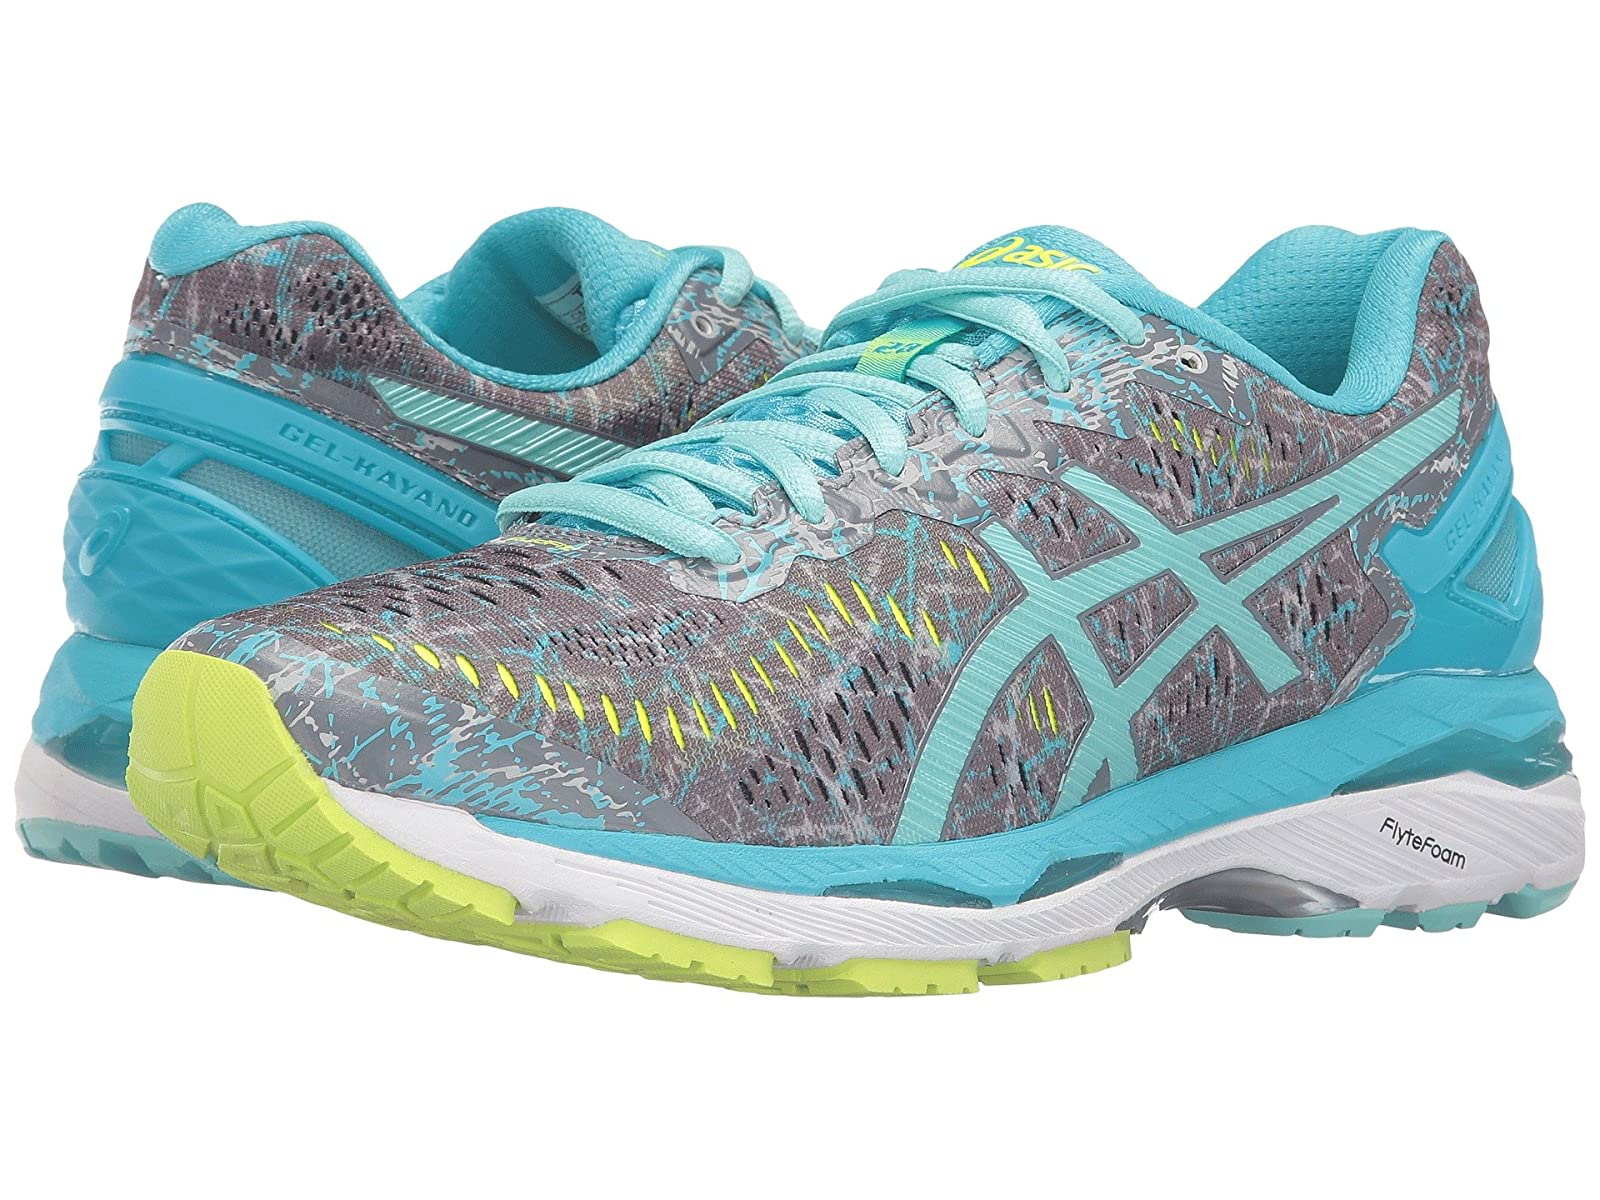 ASICS Gel-Kayano® 23Cheap and distinctive eye-catching shoes